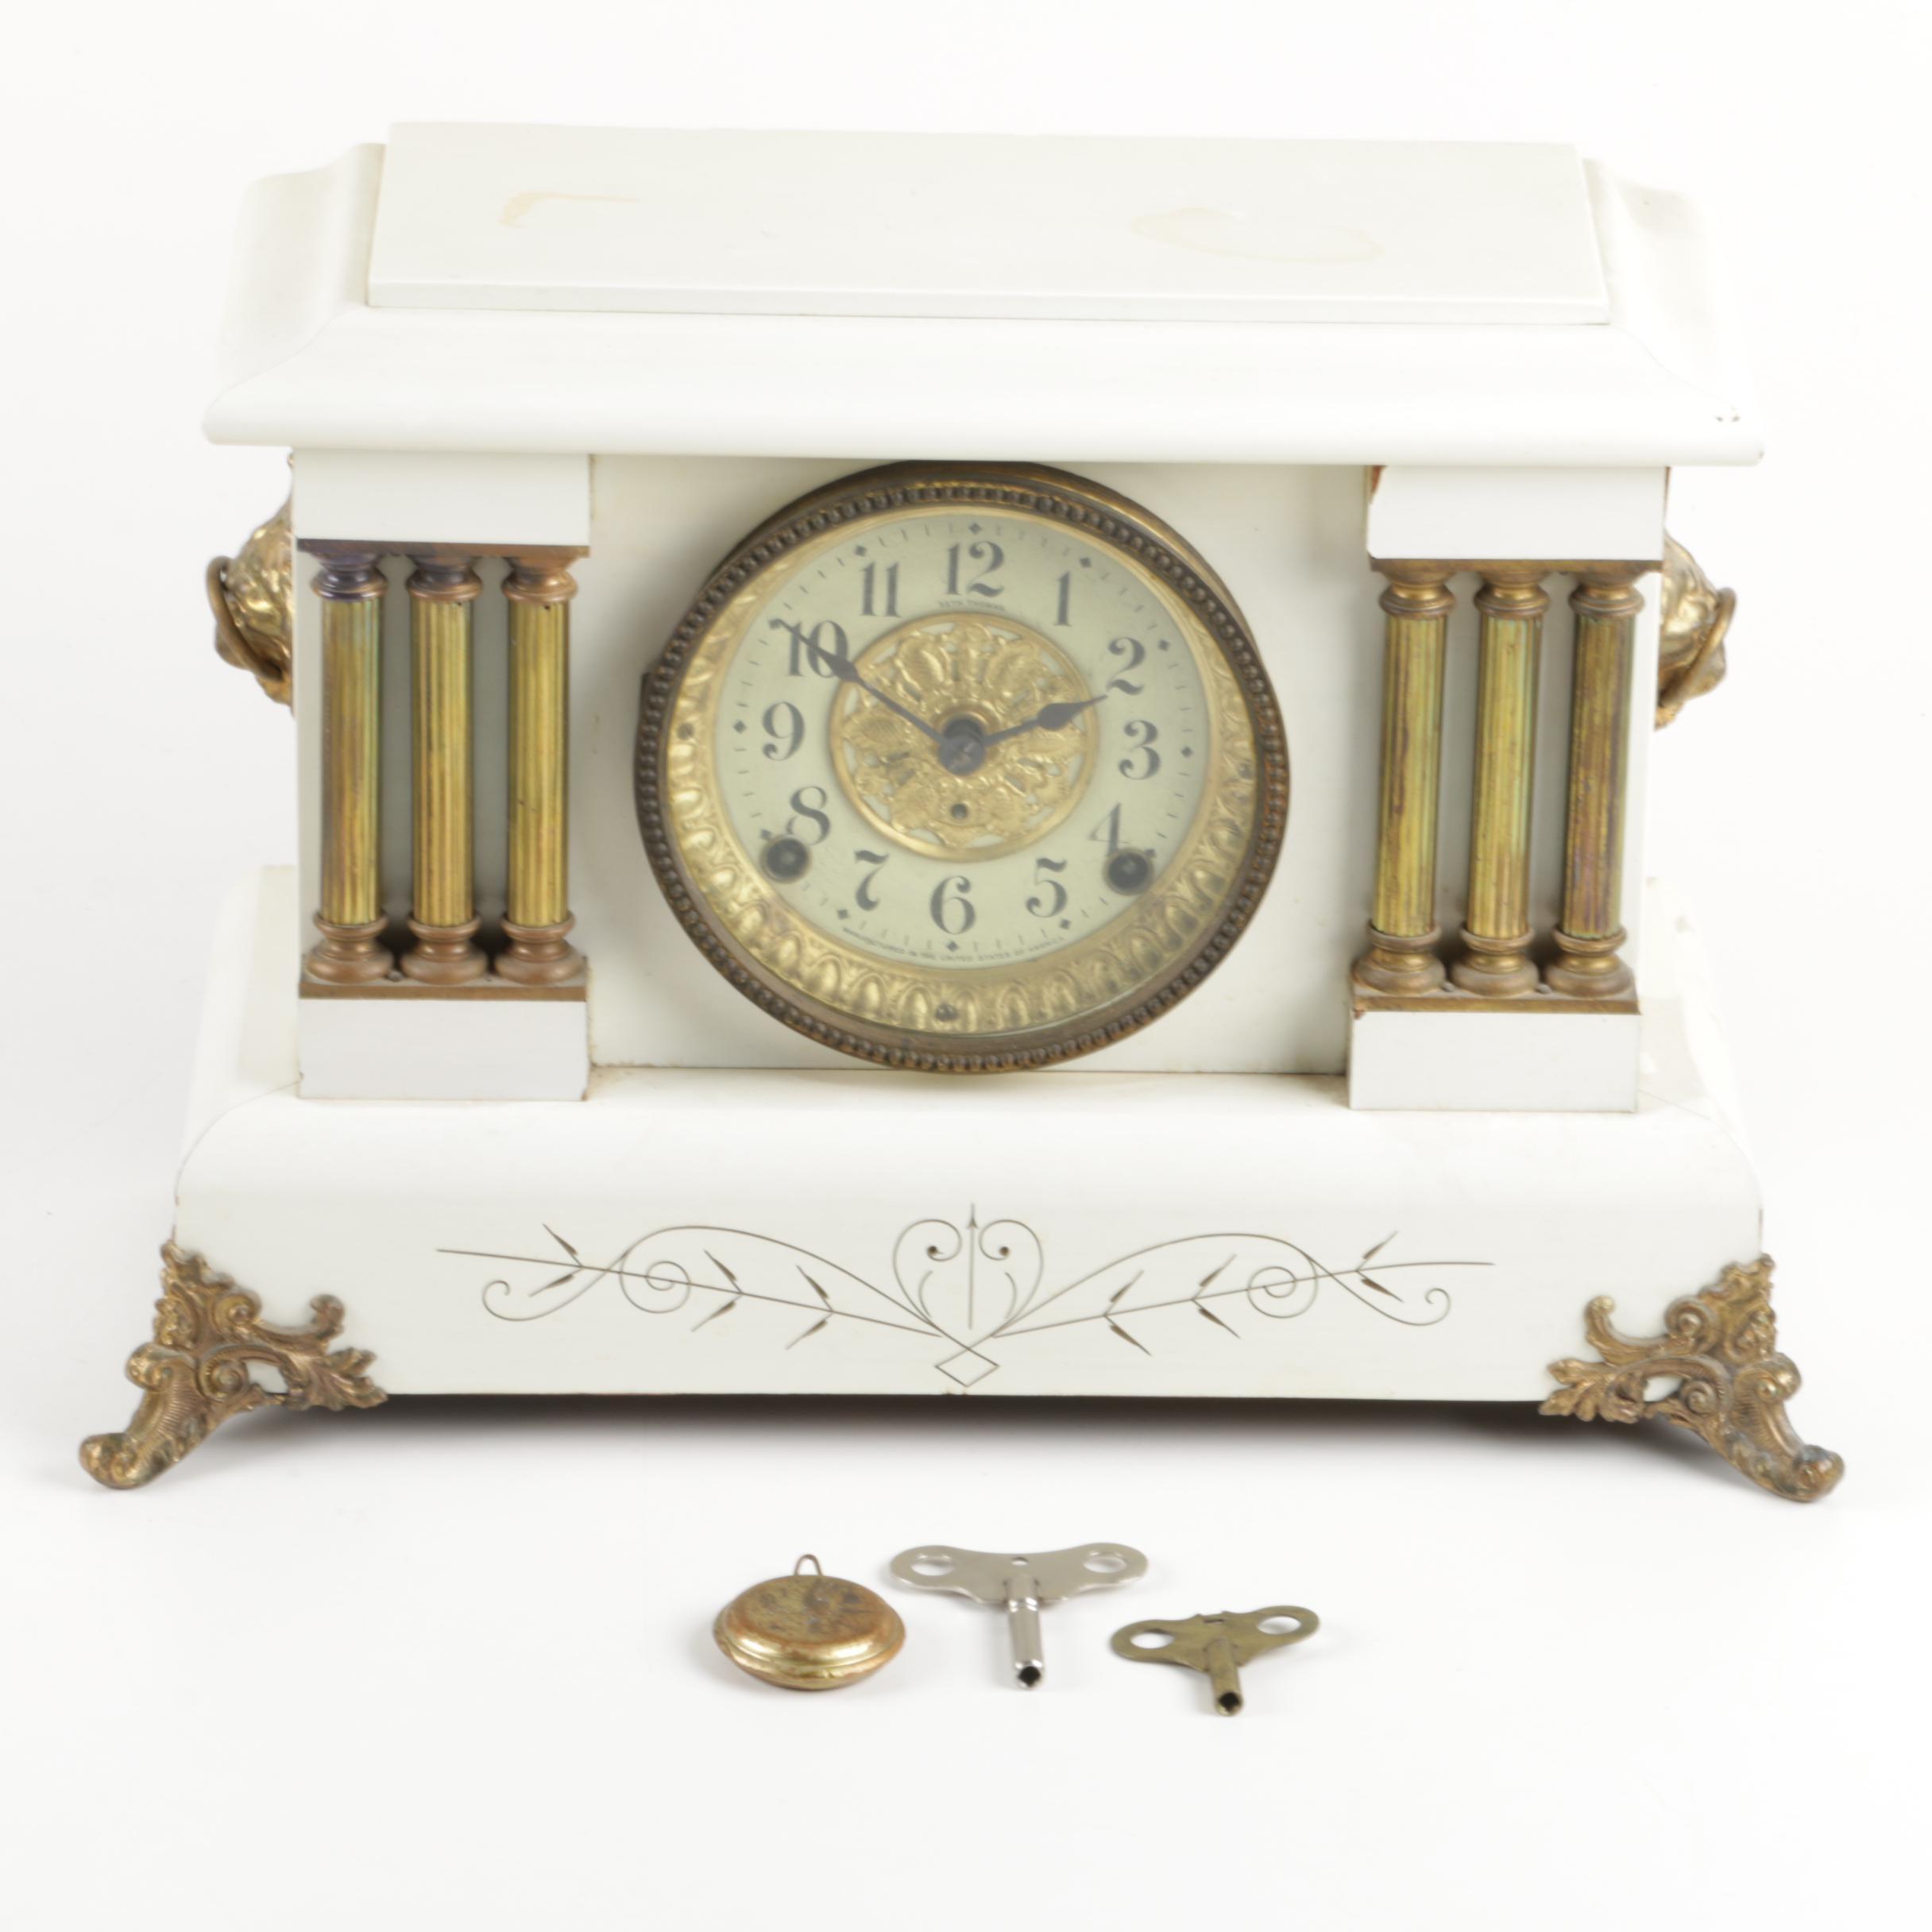 Antique 1880 Seth Thomas Pillar Mantel Clock